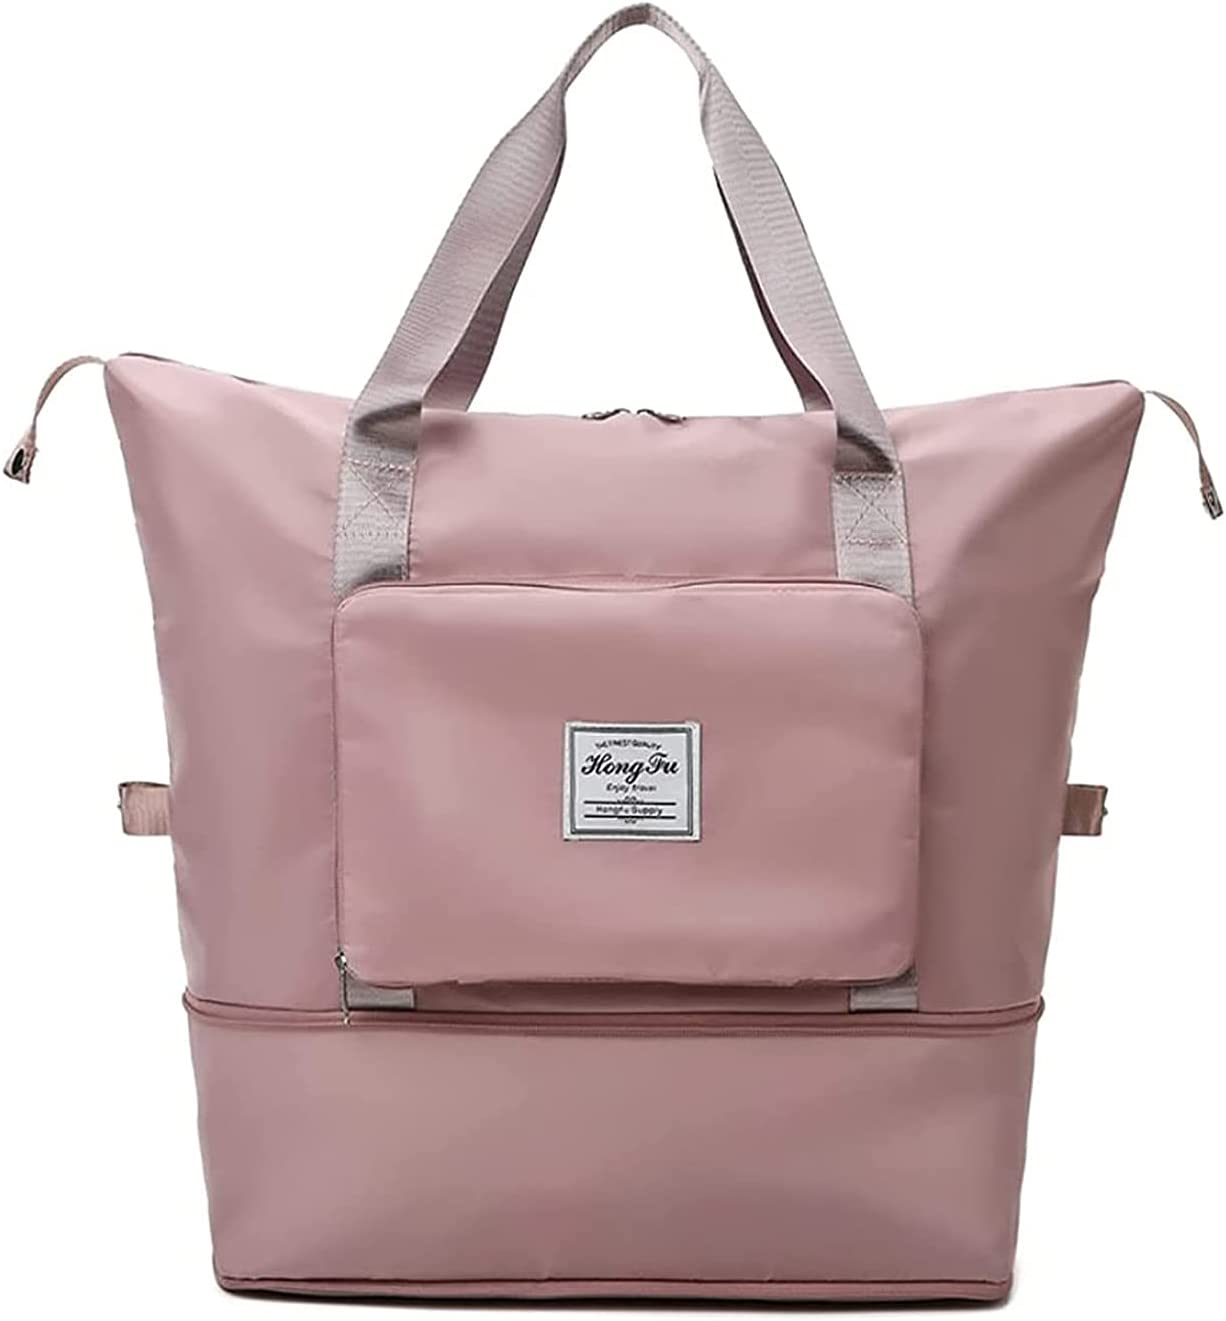 Large Atlanta Mall Ranking TOP2 Capacity Folding Travel Foldable Tra Duffel Bag